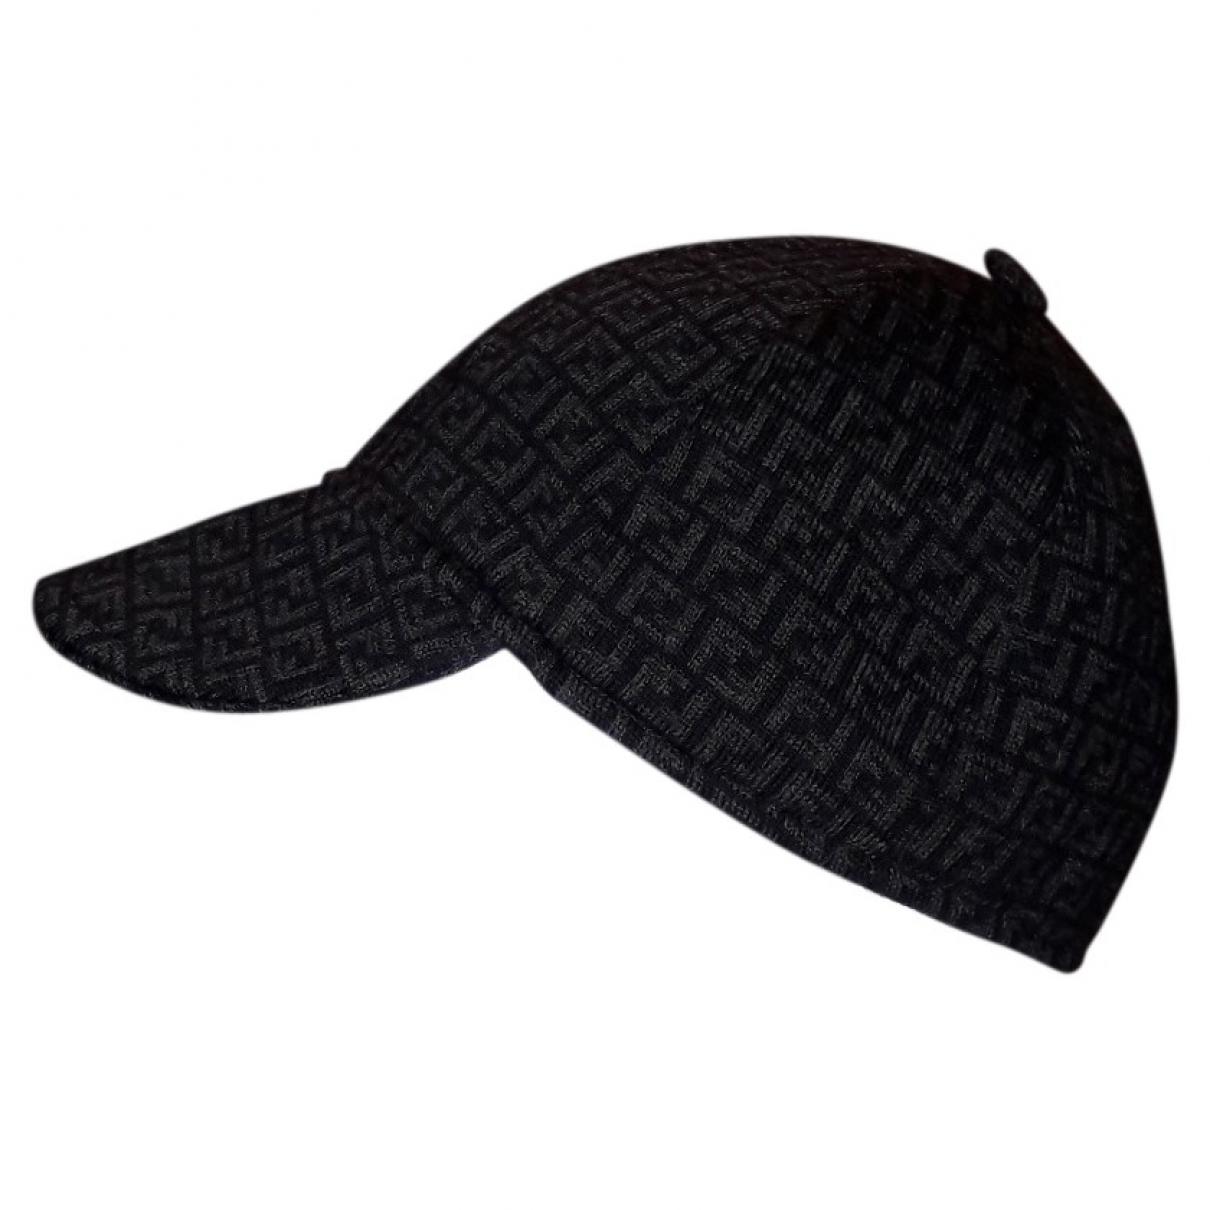 Fendi \N Grey Wool hat & pull on hat for Men 57 cm